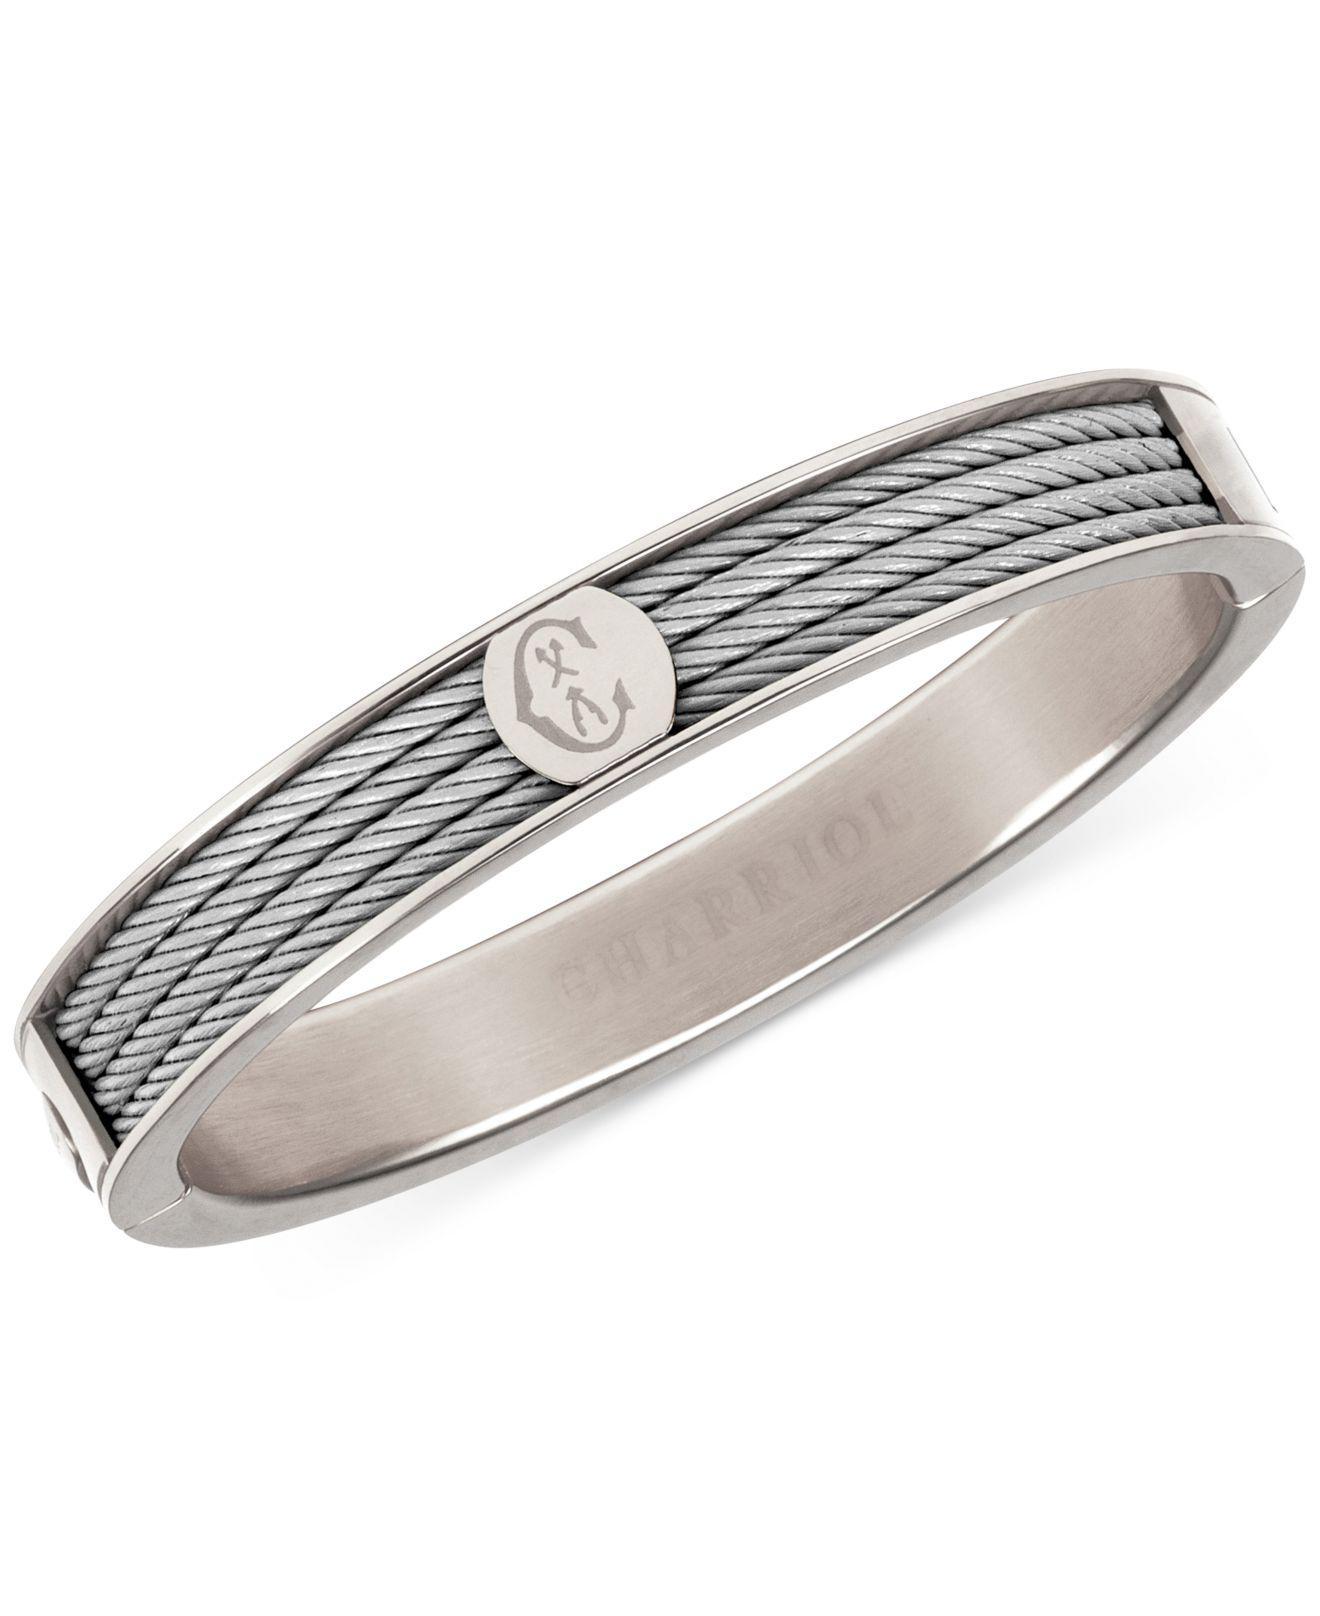 Lyst - Charriol Logo Bangle Bracelet In Stainless Steel in Metallic